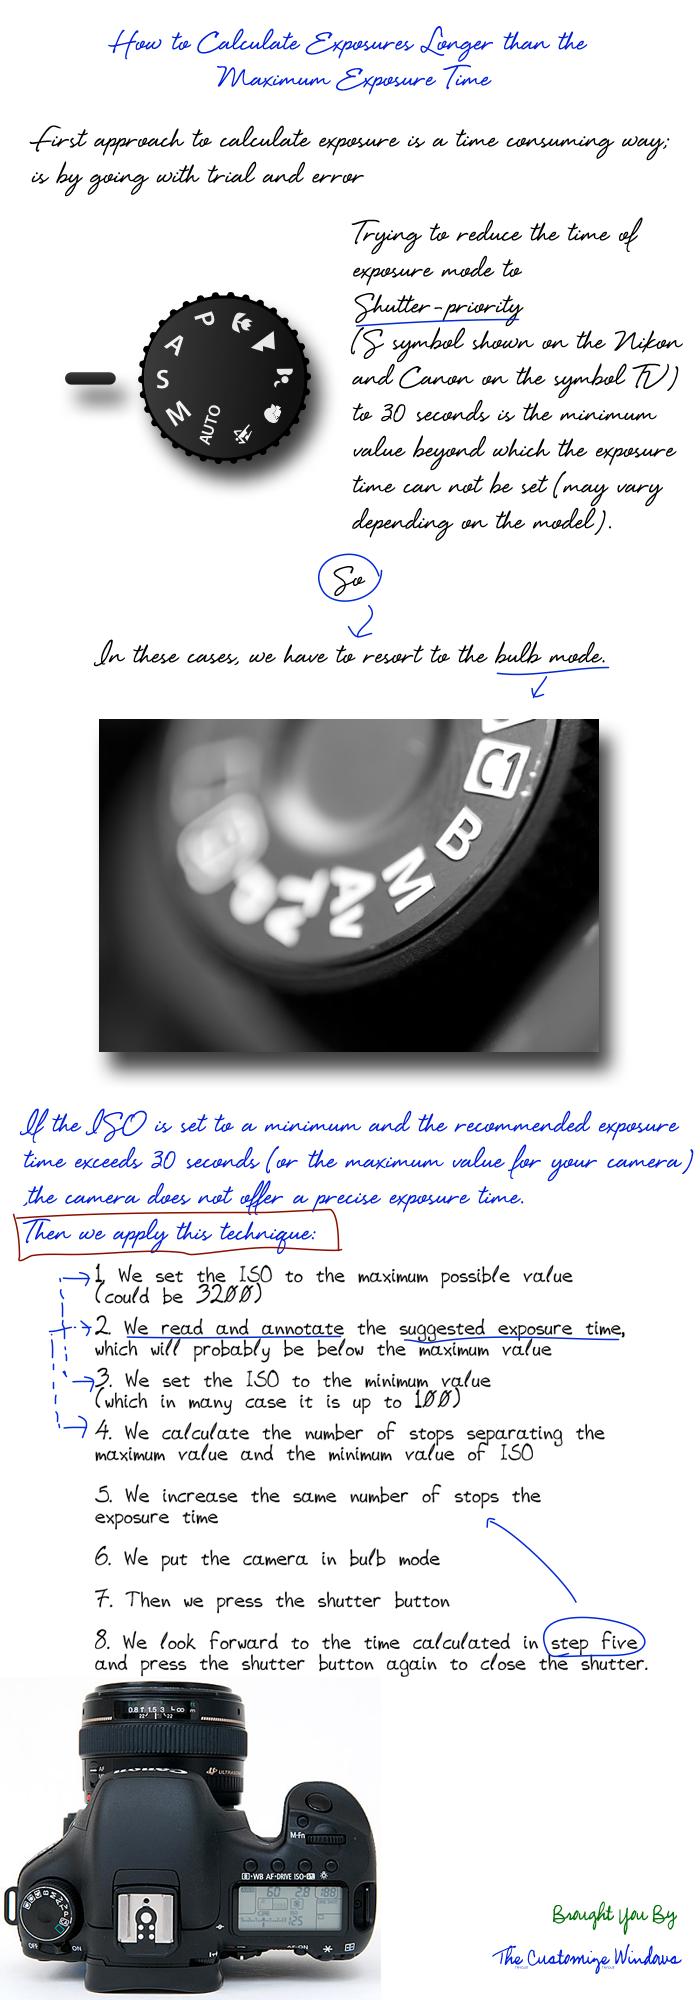 Calculate-Exposures-Longer-than-the-Maximum-Exposure-Time